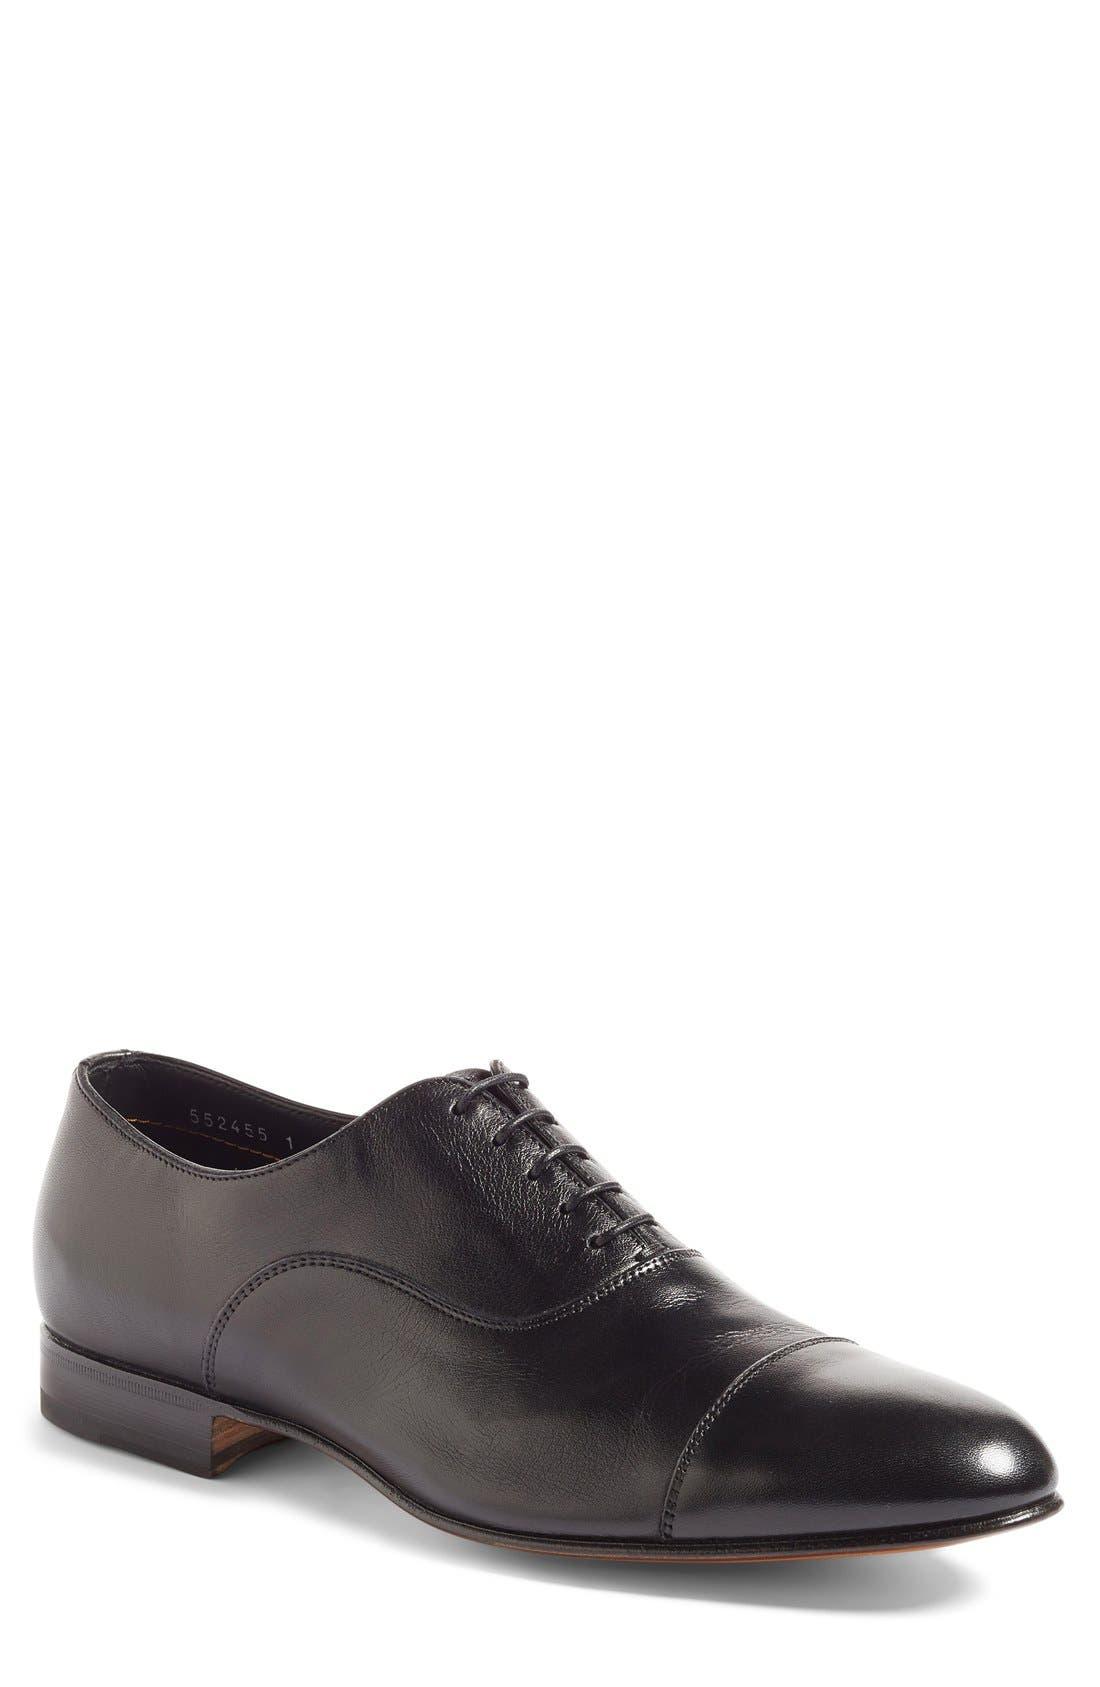 'Darian' Cap Toe Oxford,                             Main thumbnail 1, color,                             Black Leather